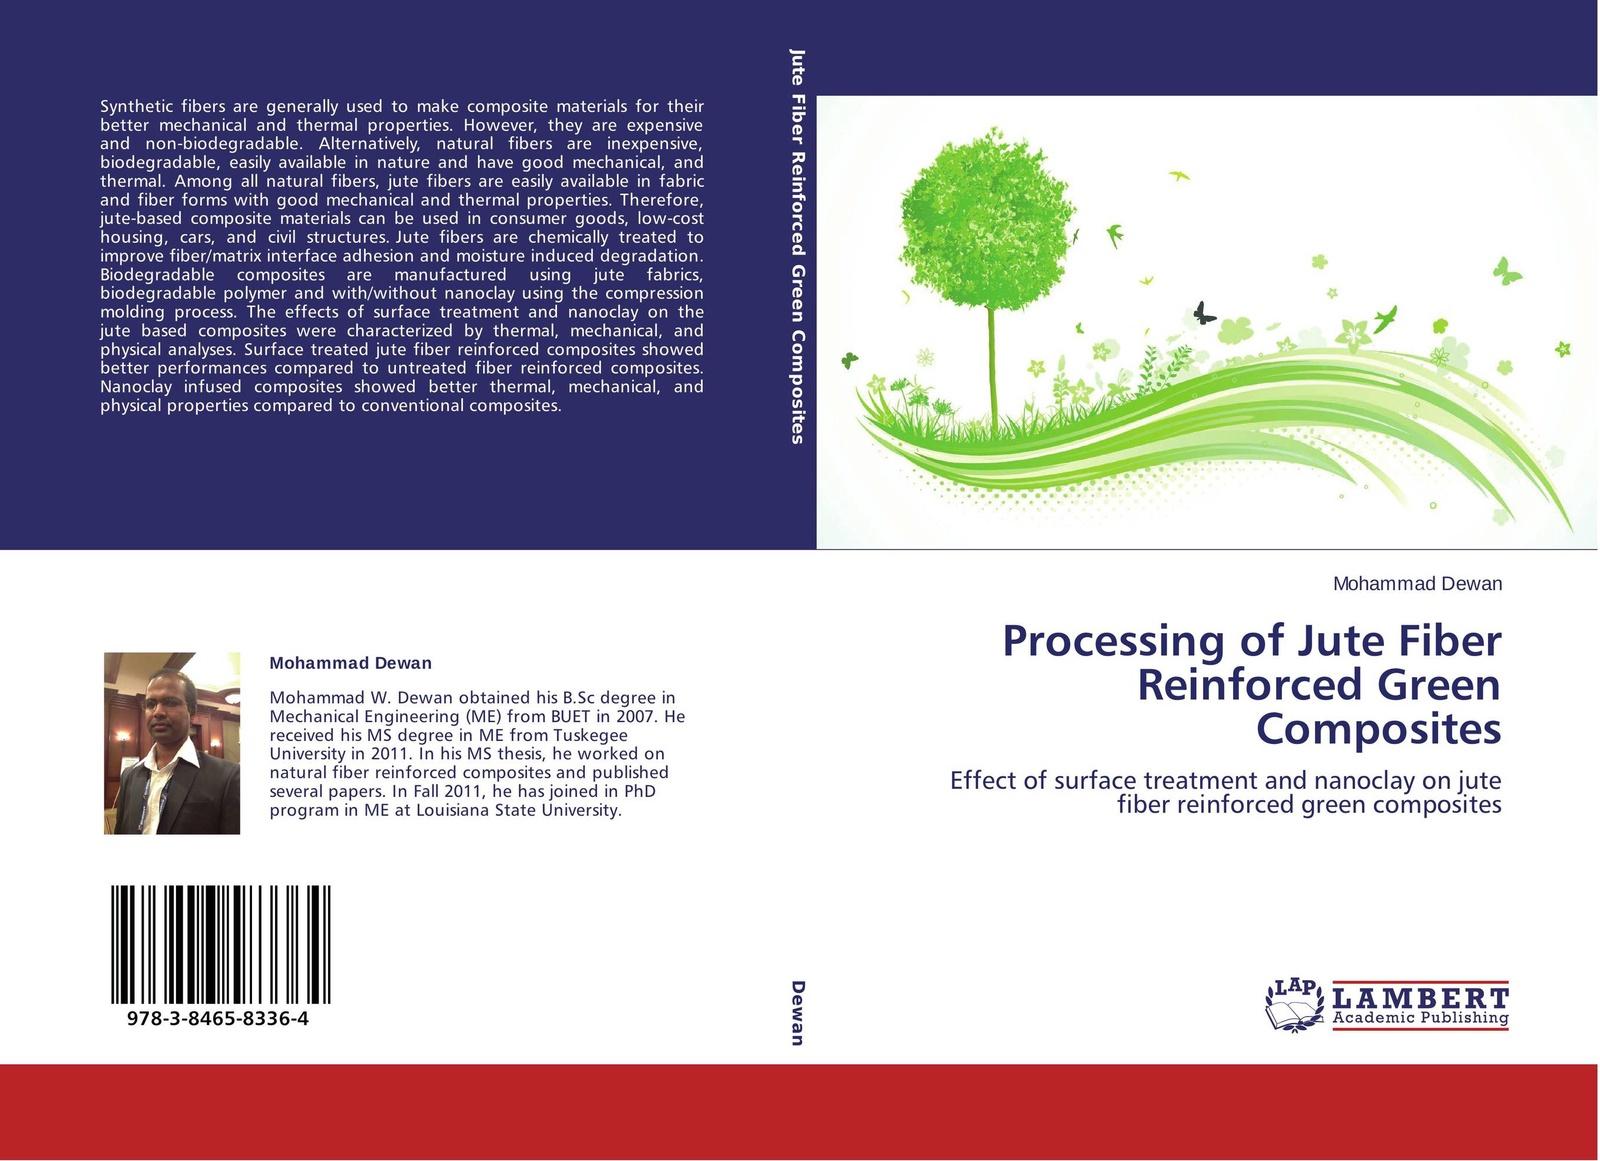 Mohammad Dewan Processing of Jute Fiber Reinforced Green Composites k chandrashekhara analysis and performance of fiber composites